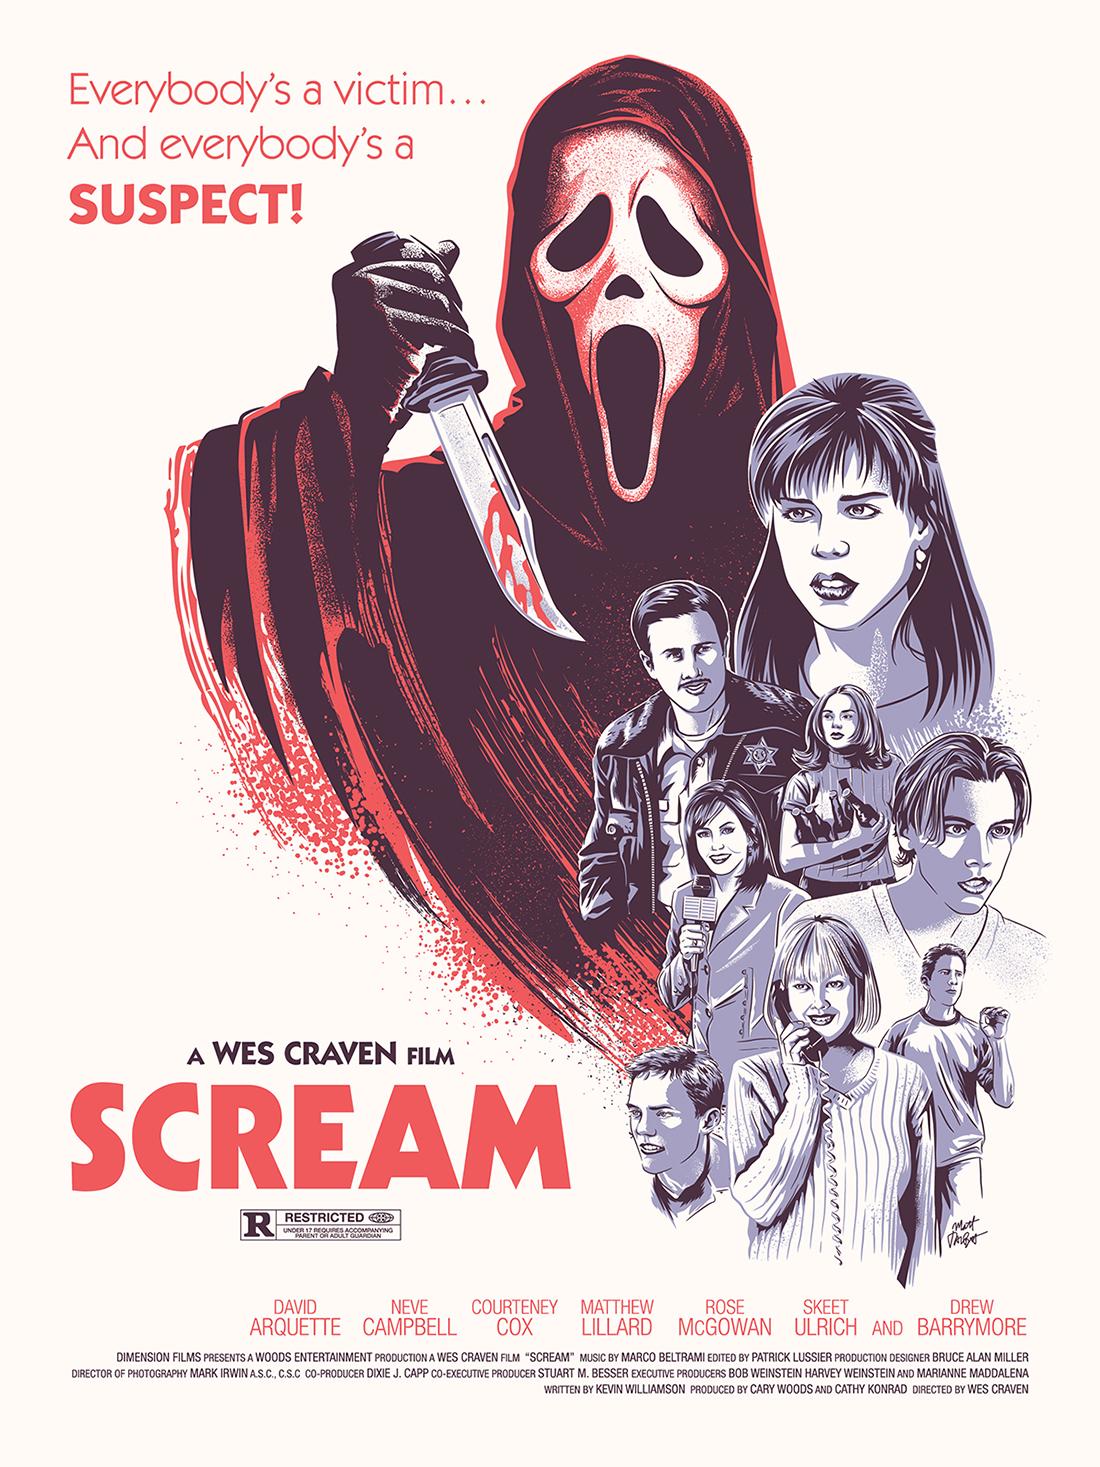 Scream poster by Matt Talbot